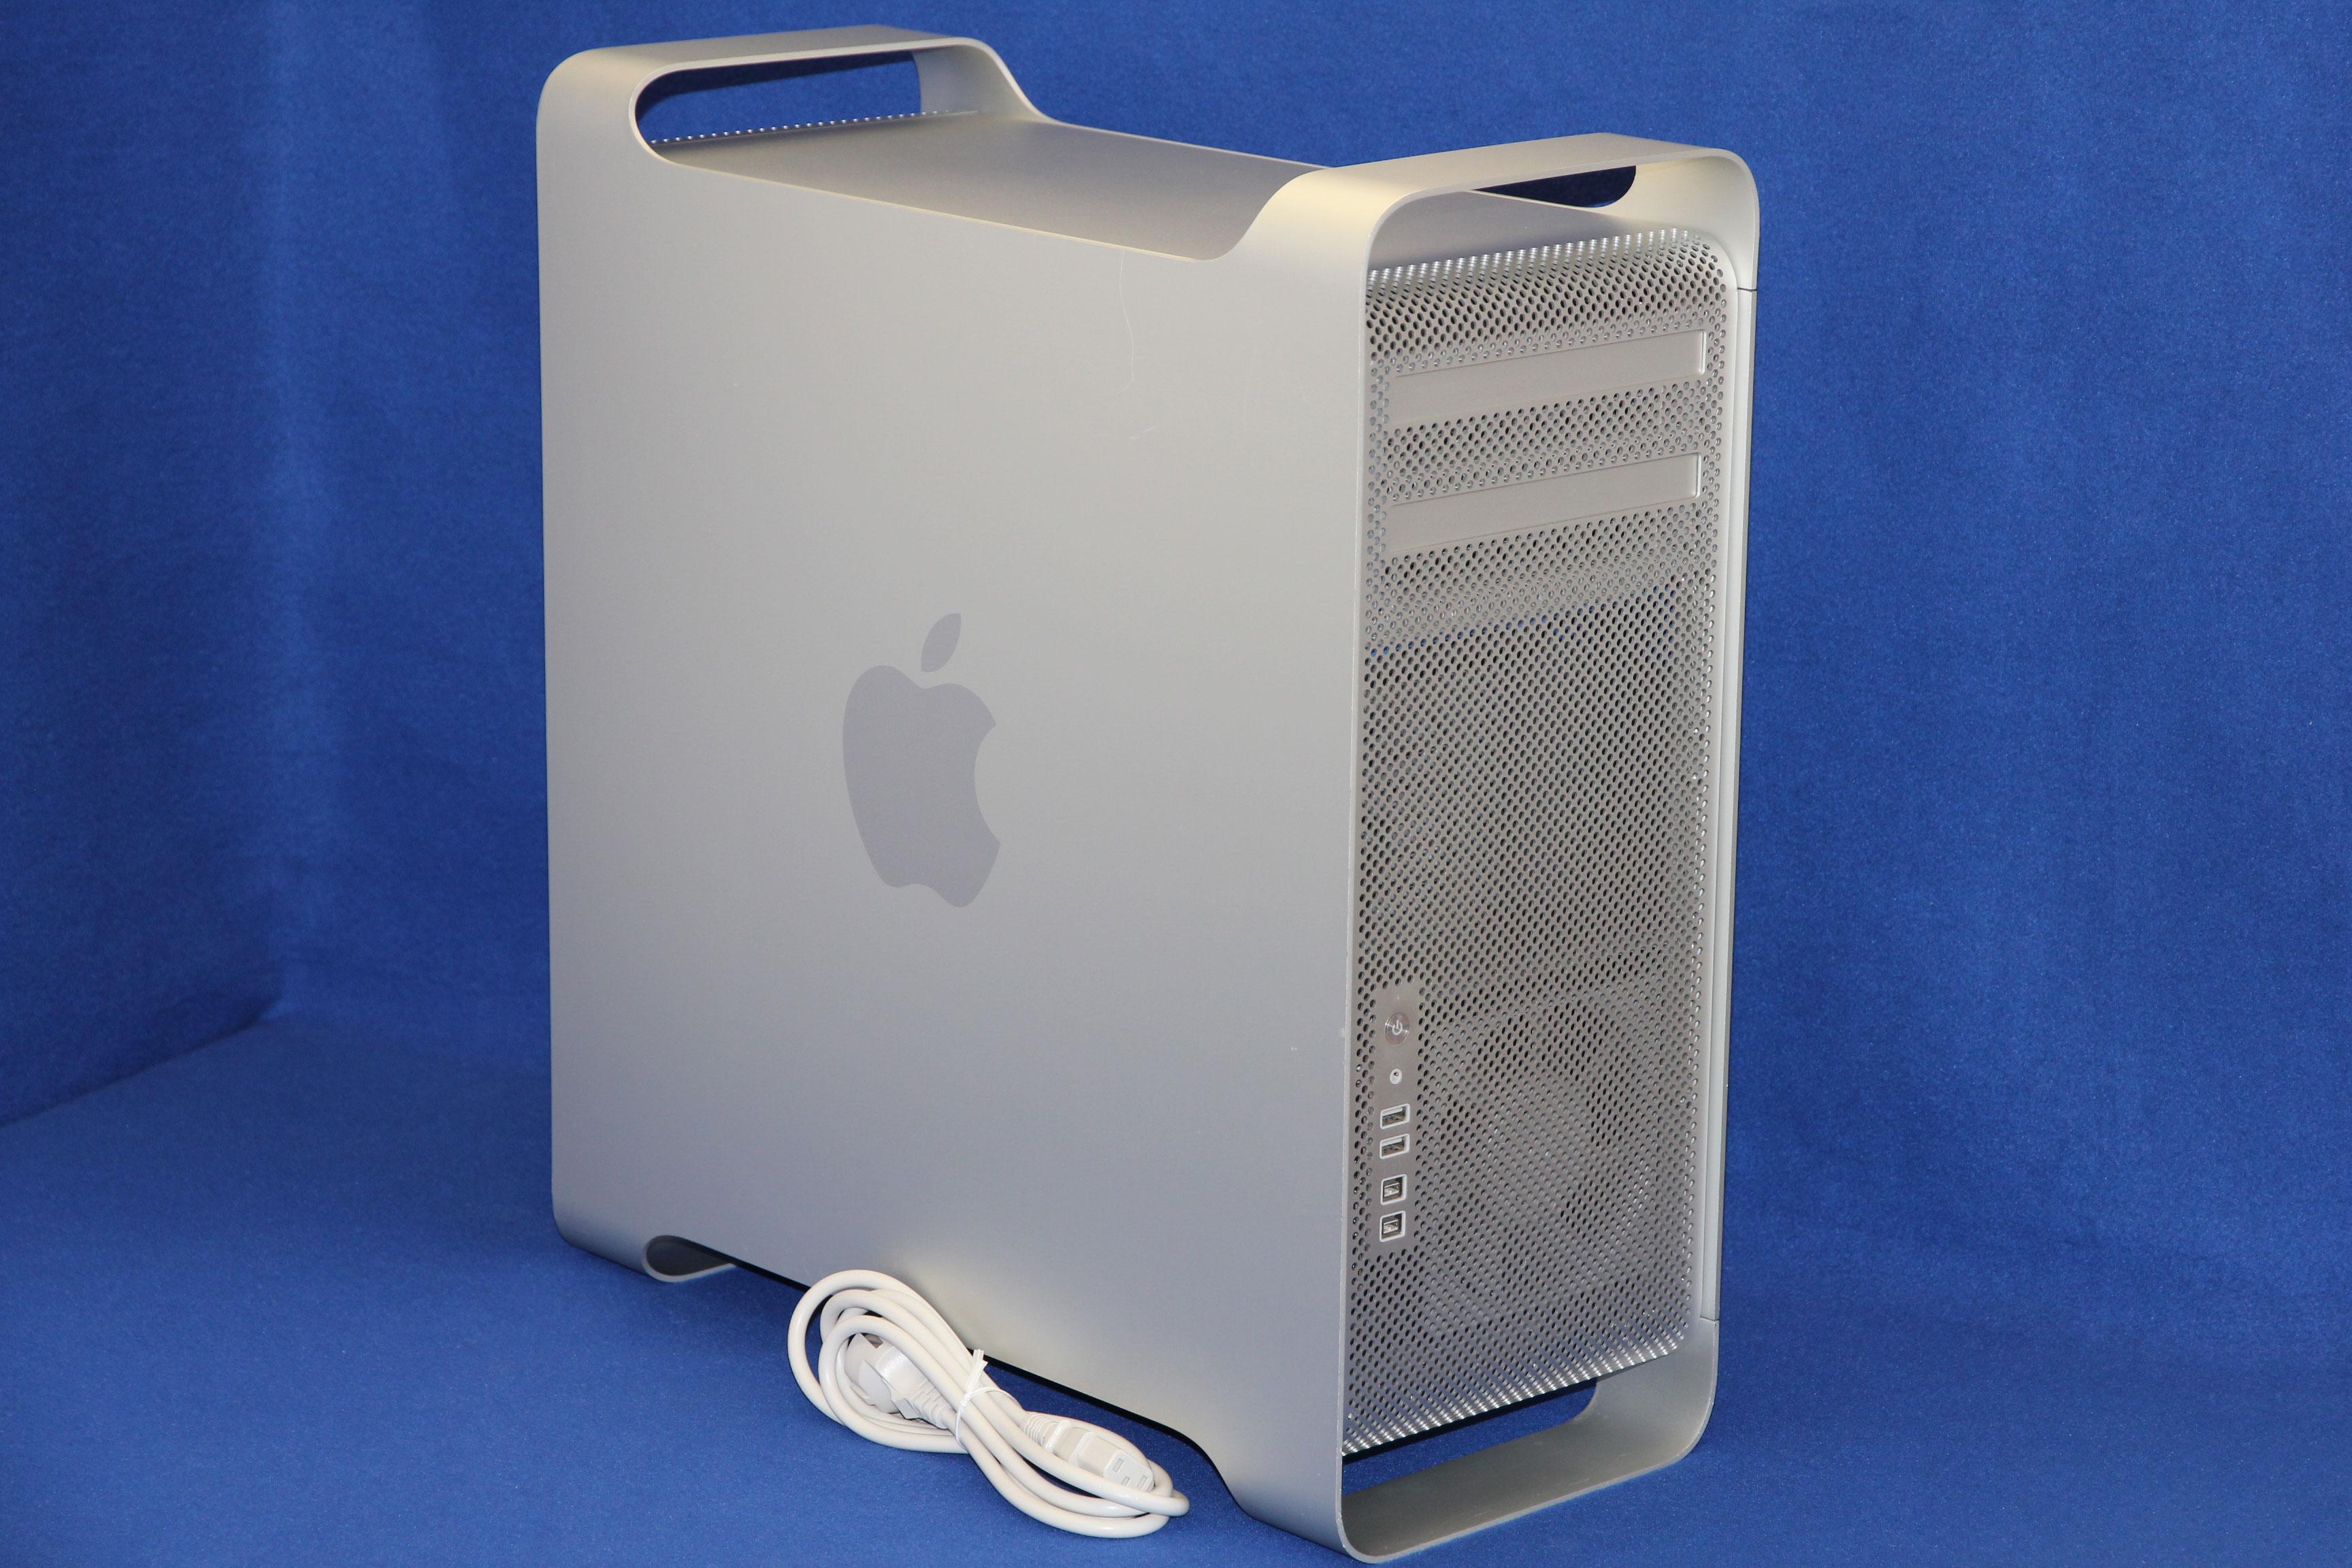 Mac pro 4, 1 in Apple Desktops and All-In-Ones eBay